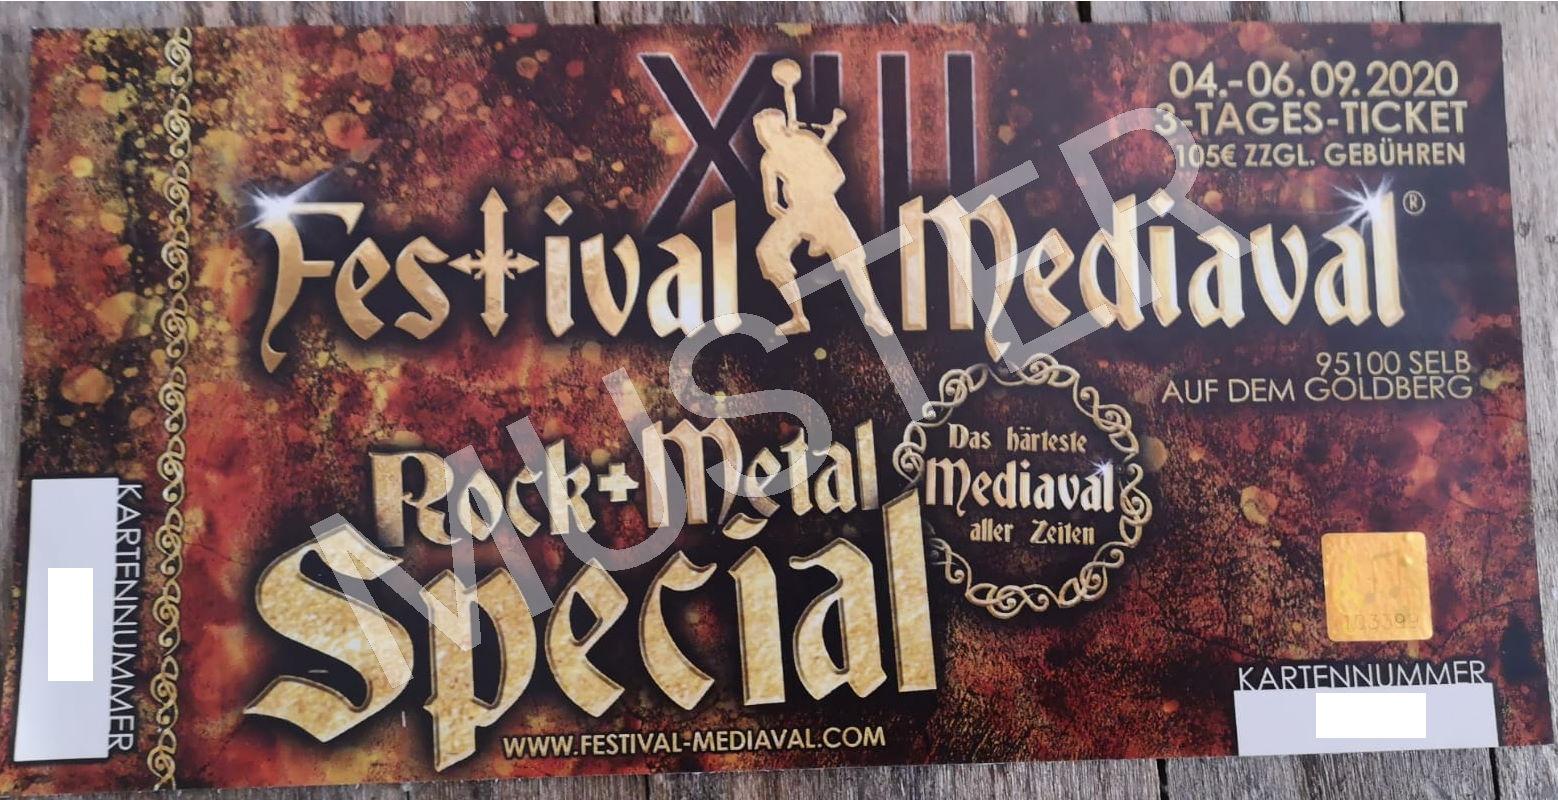 Festival-Mediaval X 2017 Ticket